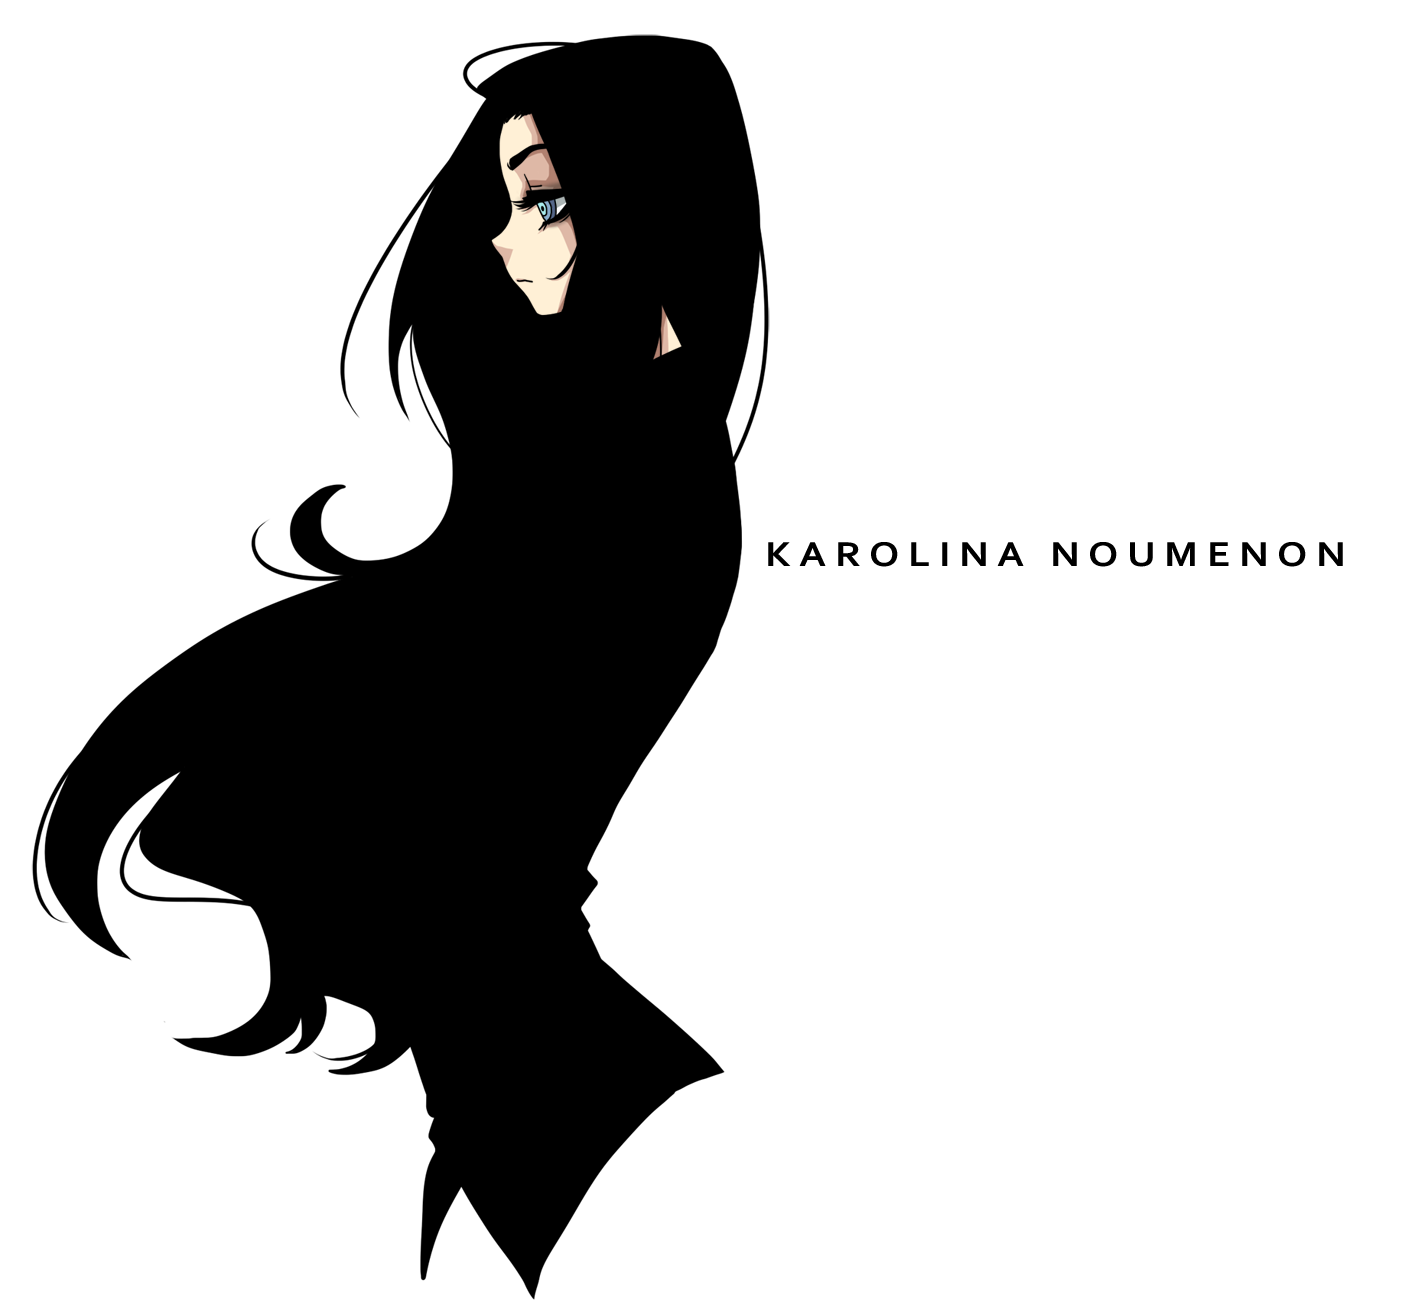 KarolinaNoumenon's Profile Picture